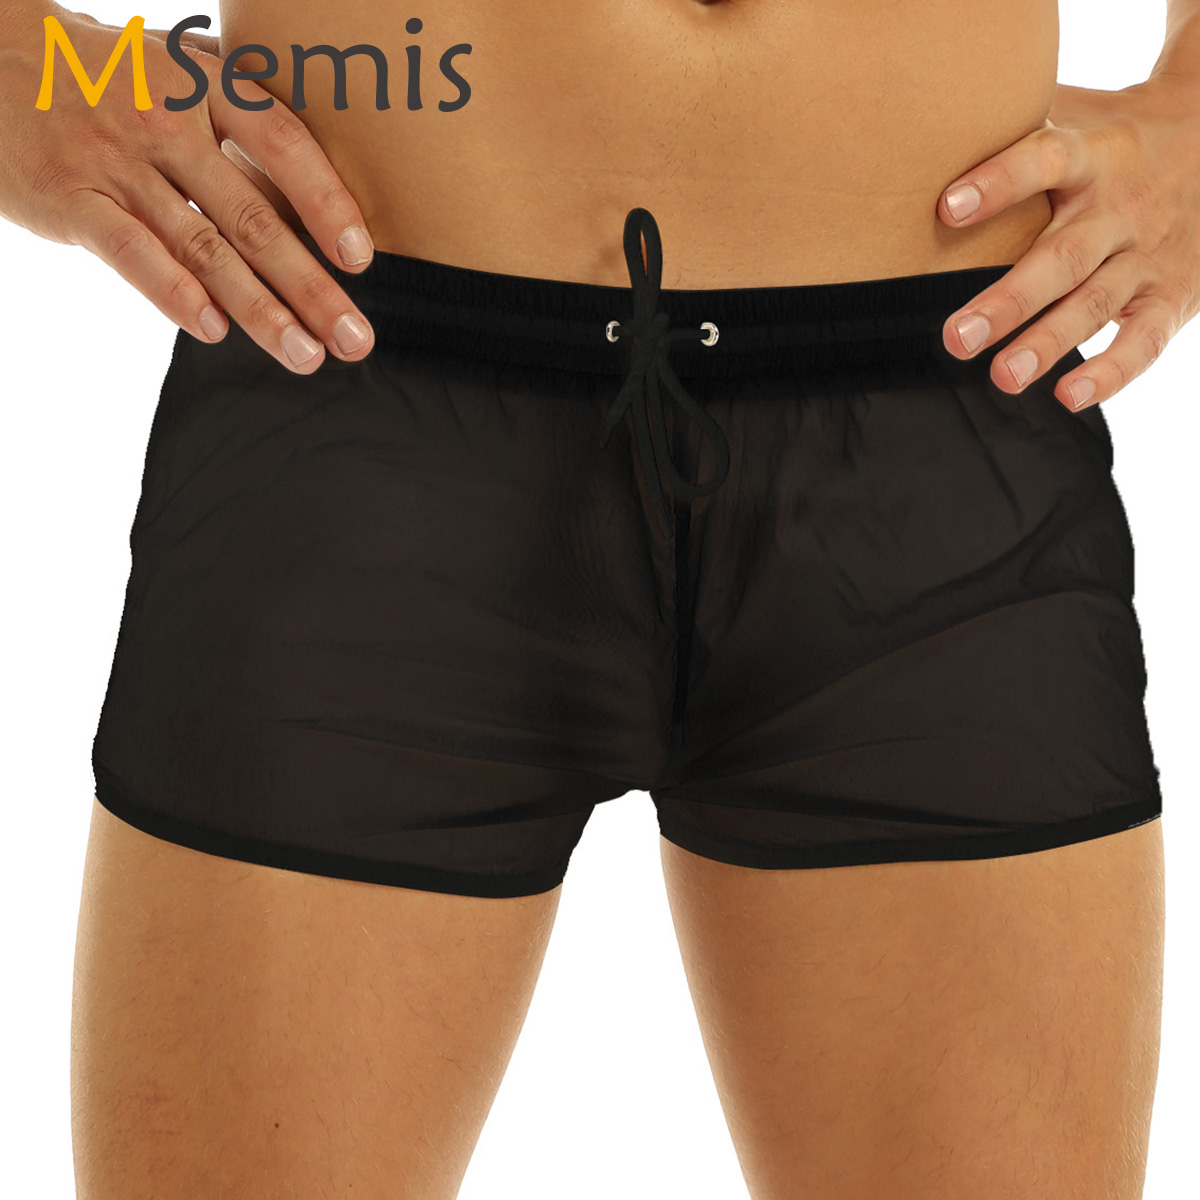 Mens Boxer Shorts See Through Shorts Fabric Drawstring Lightweight Boxer Shorts Panties Casual Swimming Wear Shorts Sleepwear